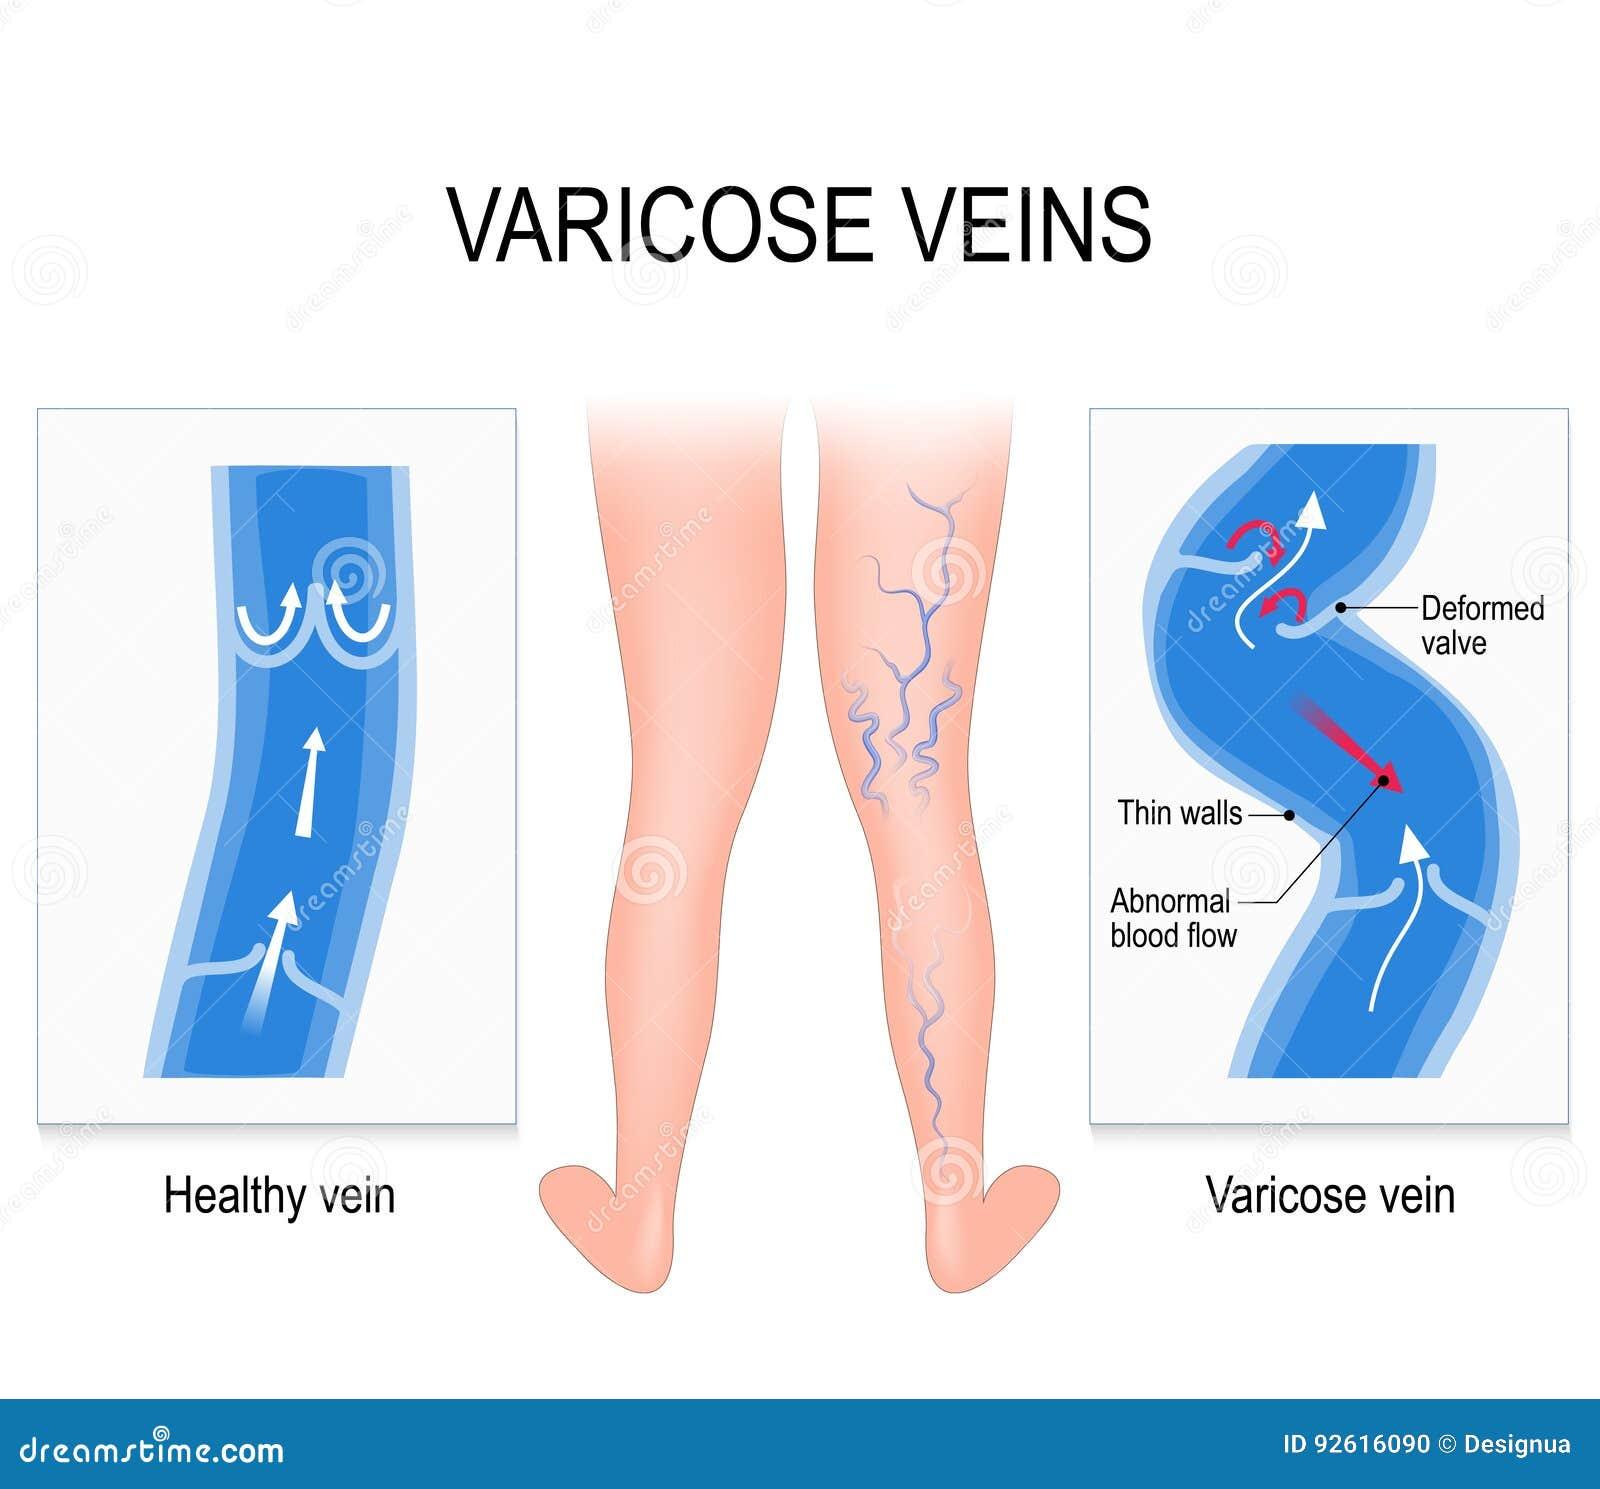 stomch ulcer diagram varicose veins. medical illustration stock vector ...